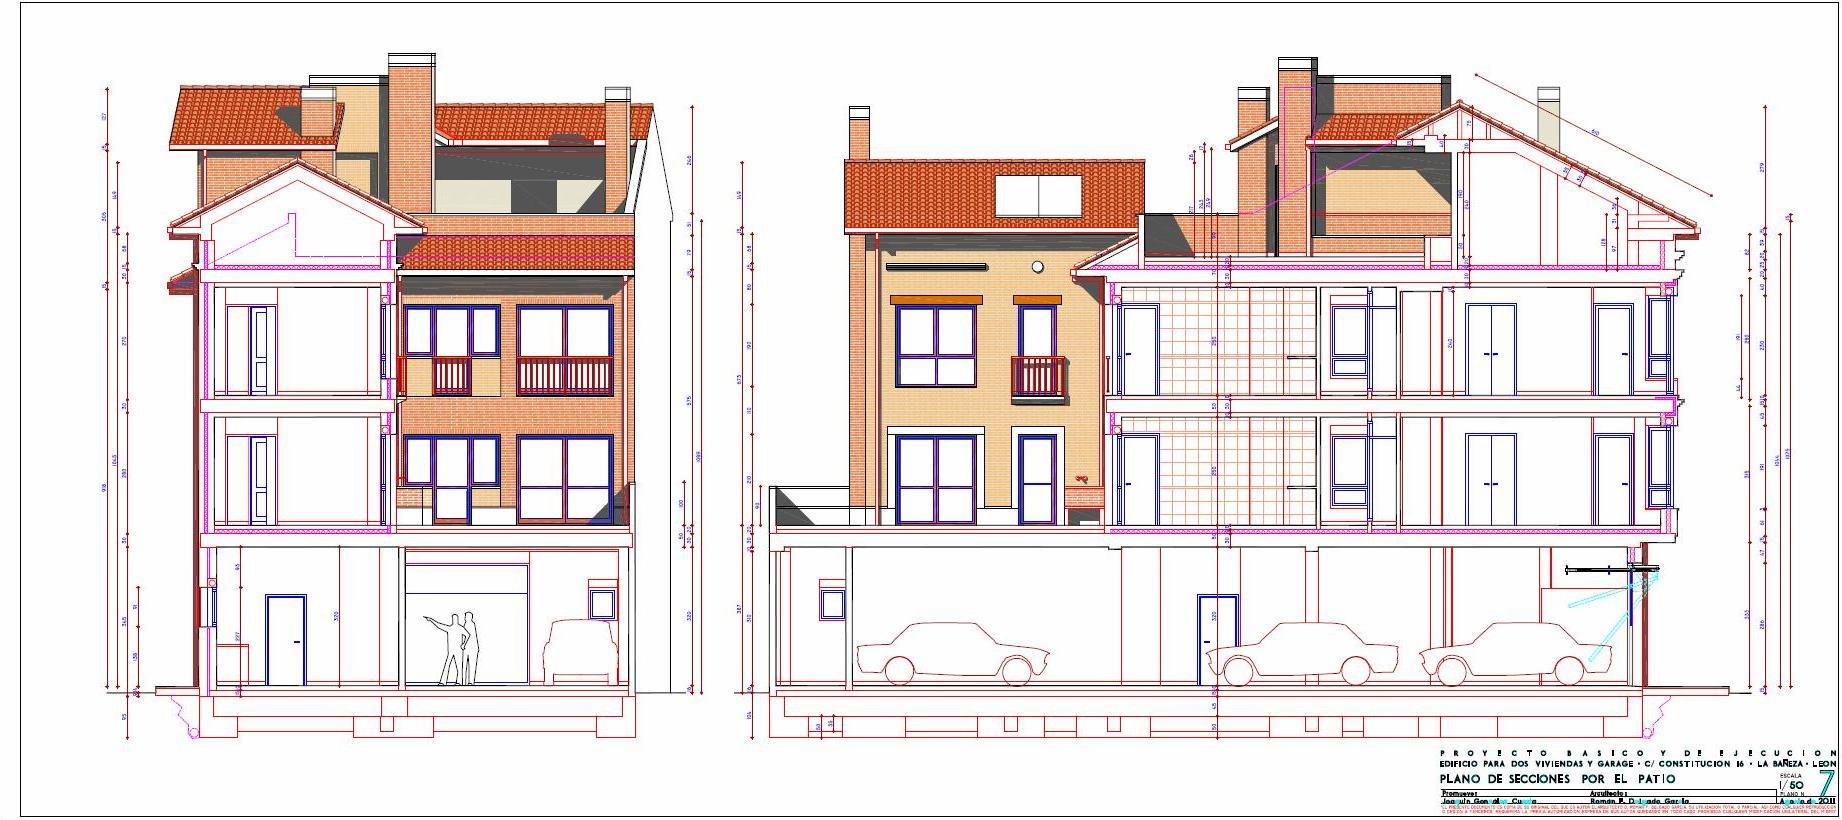 arquitecto en cudillero, asturias | viviendas calle constitucion